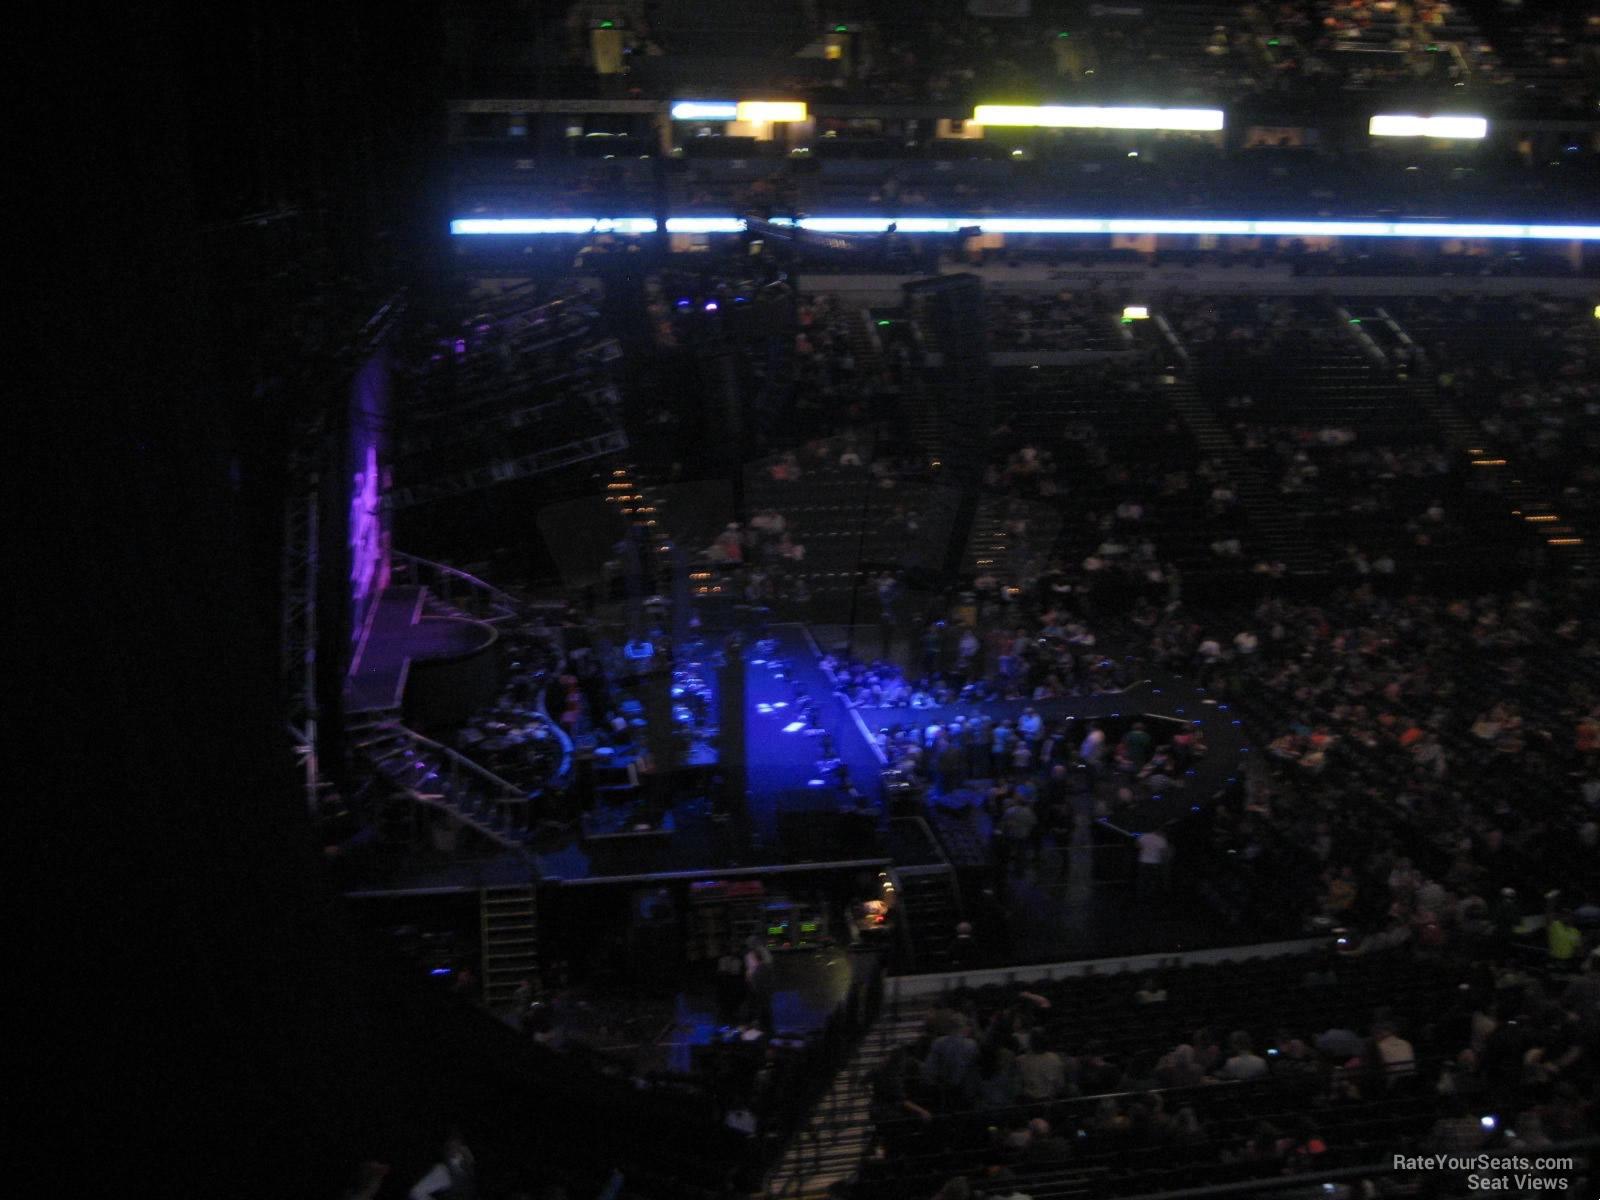 Bridgestone Arena Seating Chart By Row >> Bridgestone Arena Section 213 Concert Seating - RateYourSeats.com